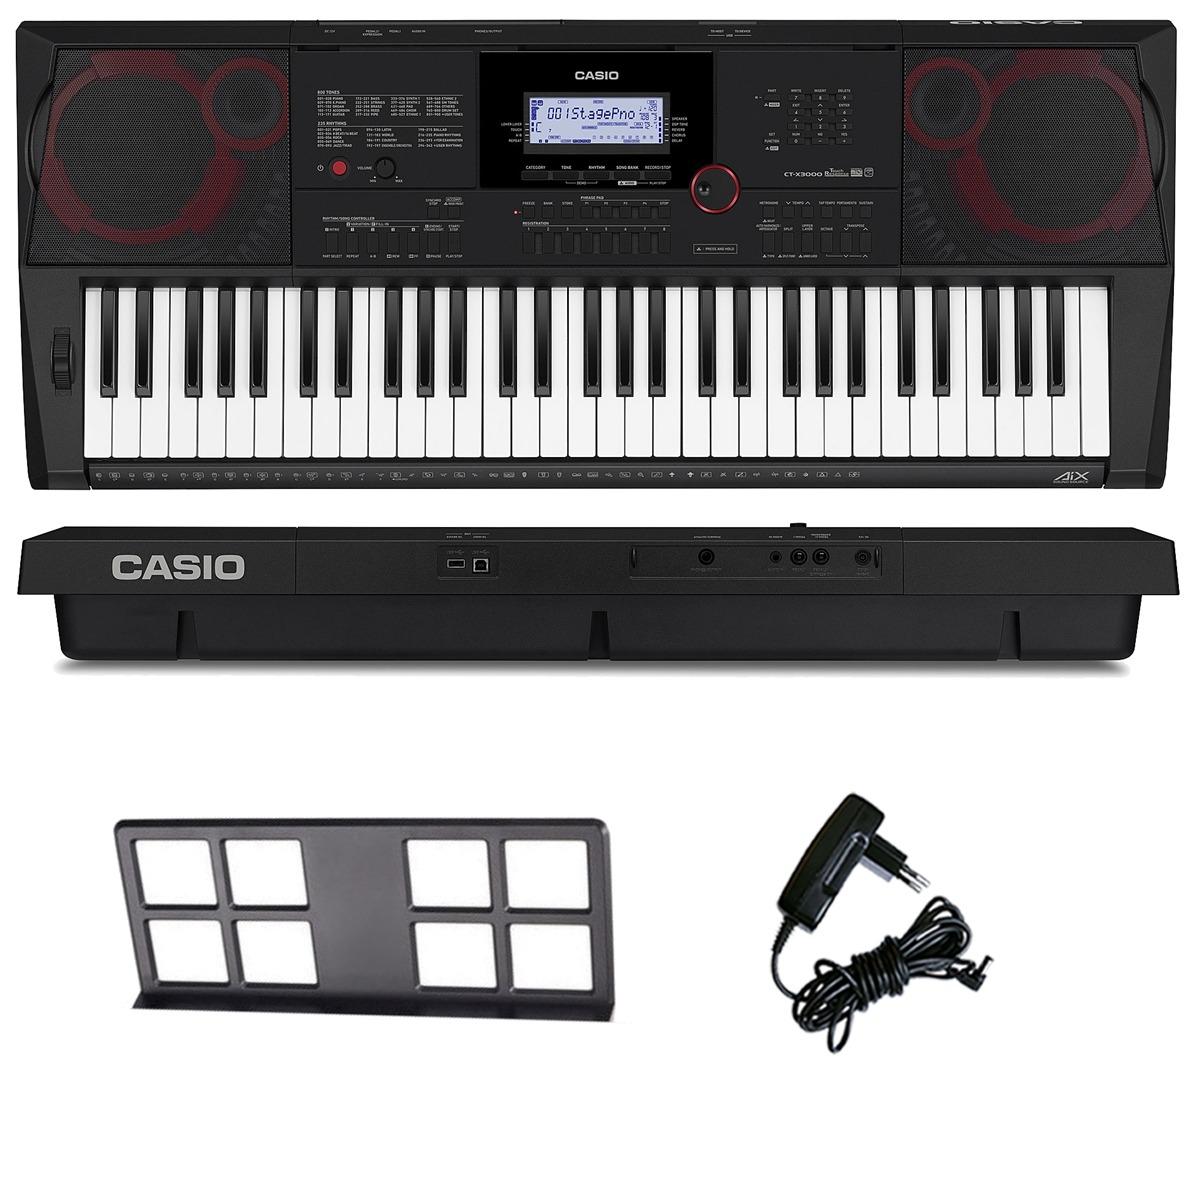 4571b016a90 teclado arranjador musical 61 teclas ctx3000 casio com fonte. Carregando  zoom.